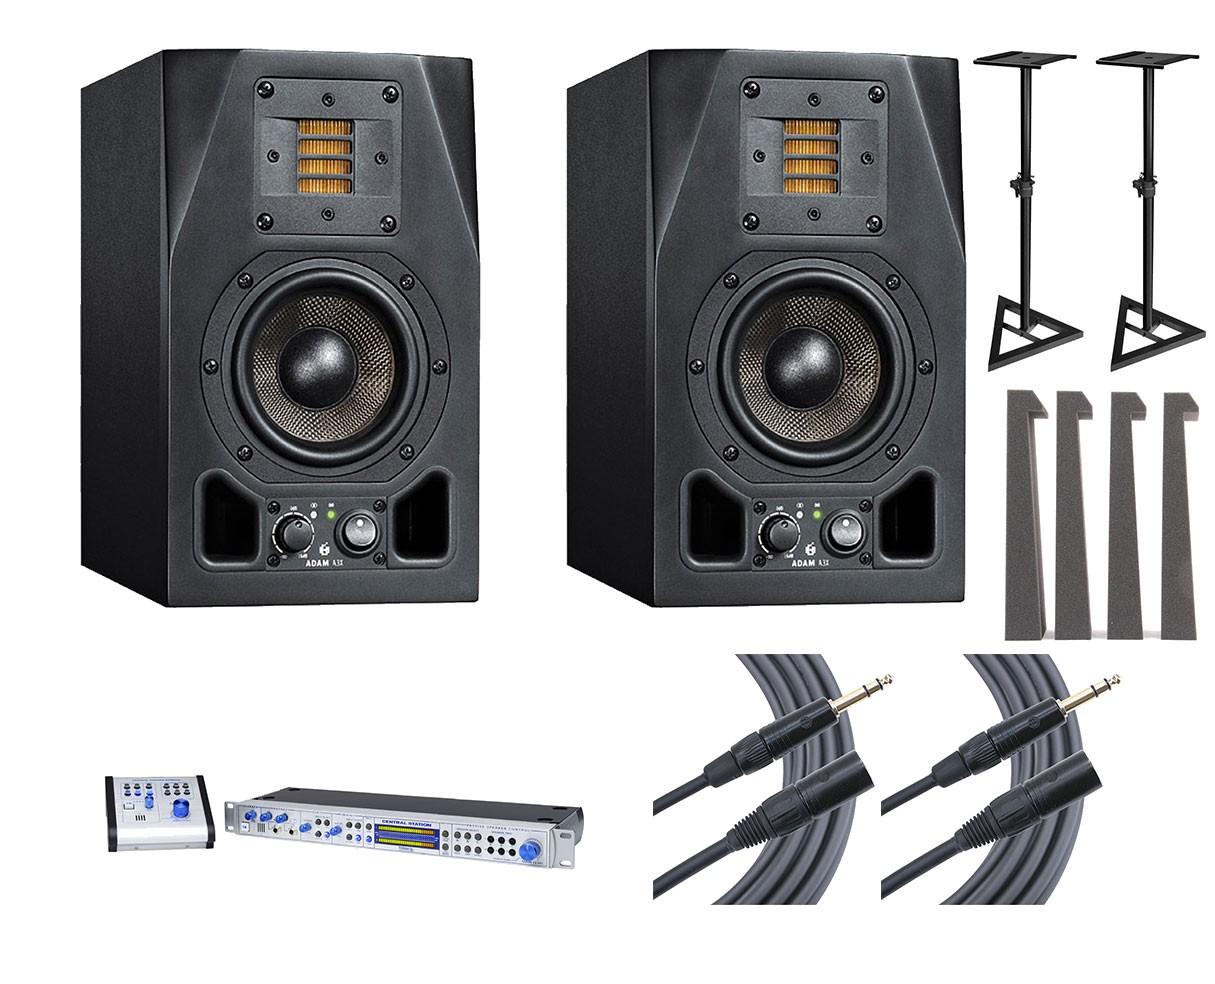 2x ADAM A3X + Central Station PLUS + Stands + MoPADs + Cables